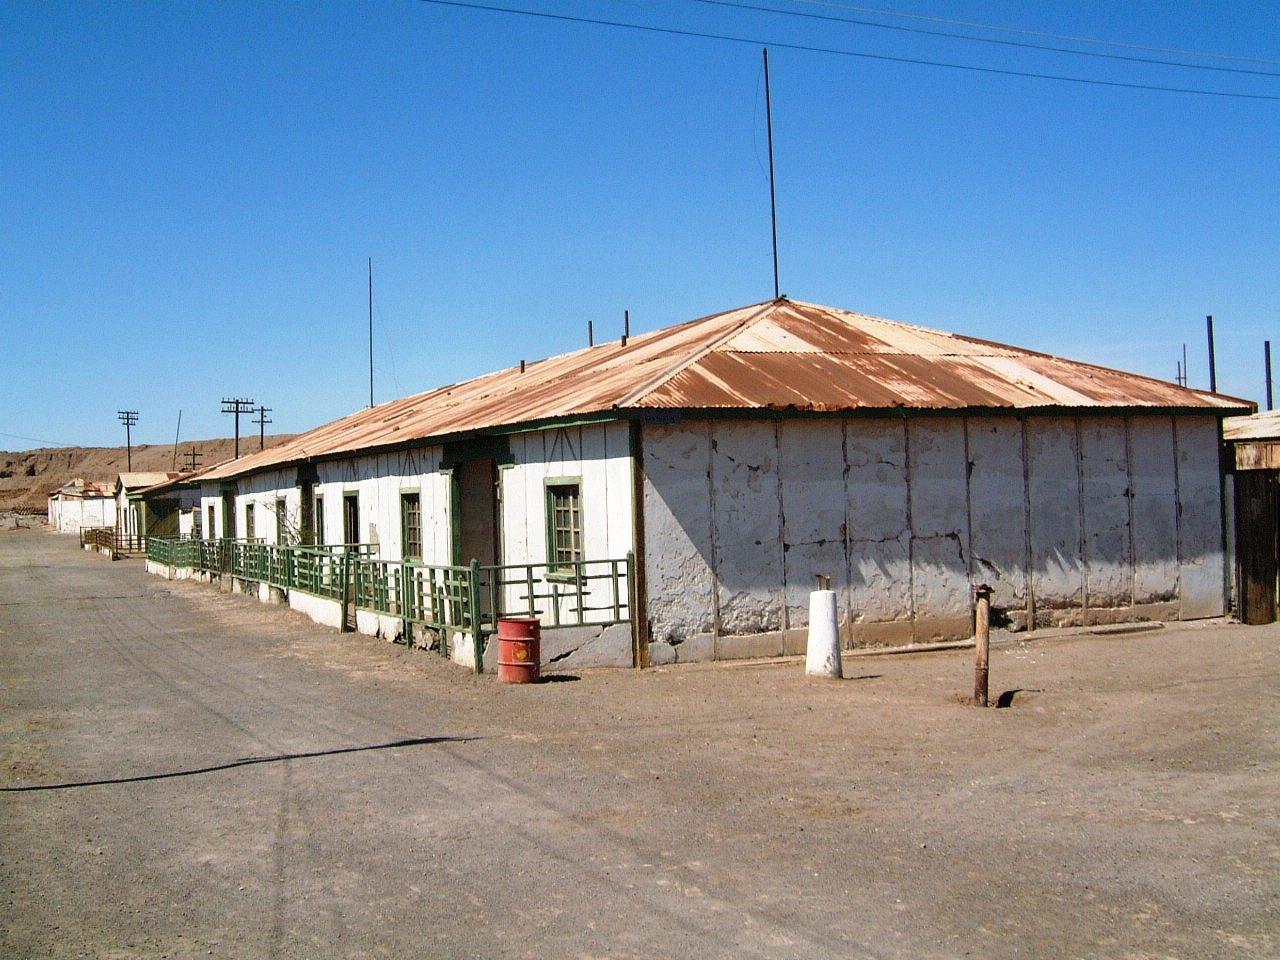 http://3.bp.blogspot.com/-DalZGcgwLs4/TV_WVHvH7VI/AAAAAAAAK1o/oZc81MRnOcE/s1600/17++Humberstone_Chile.jpg